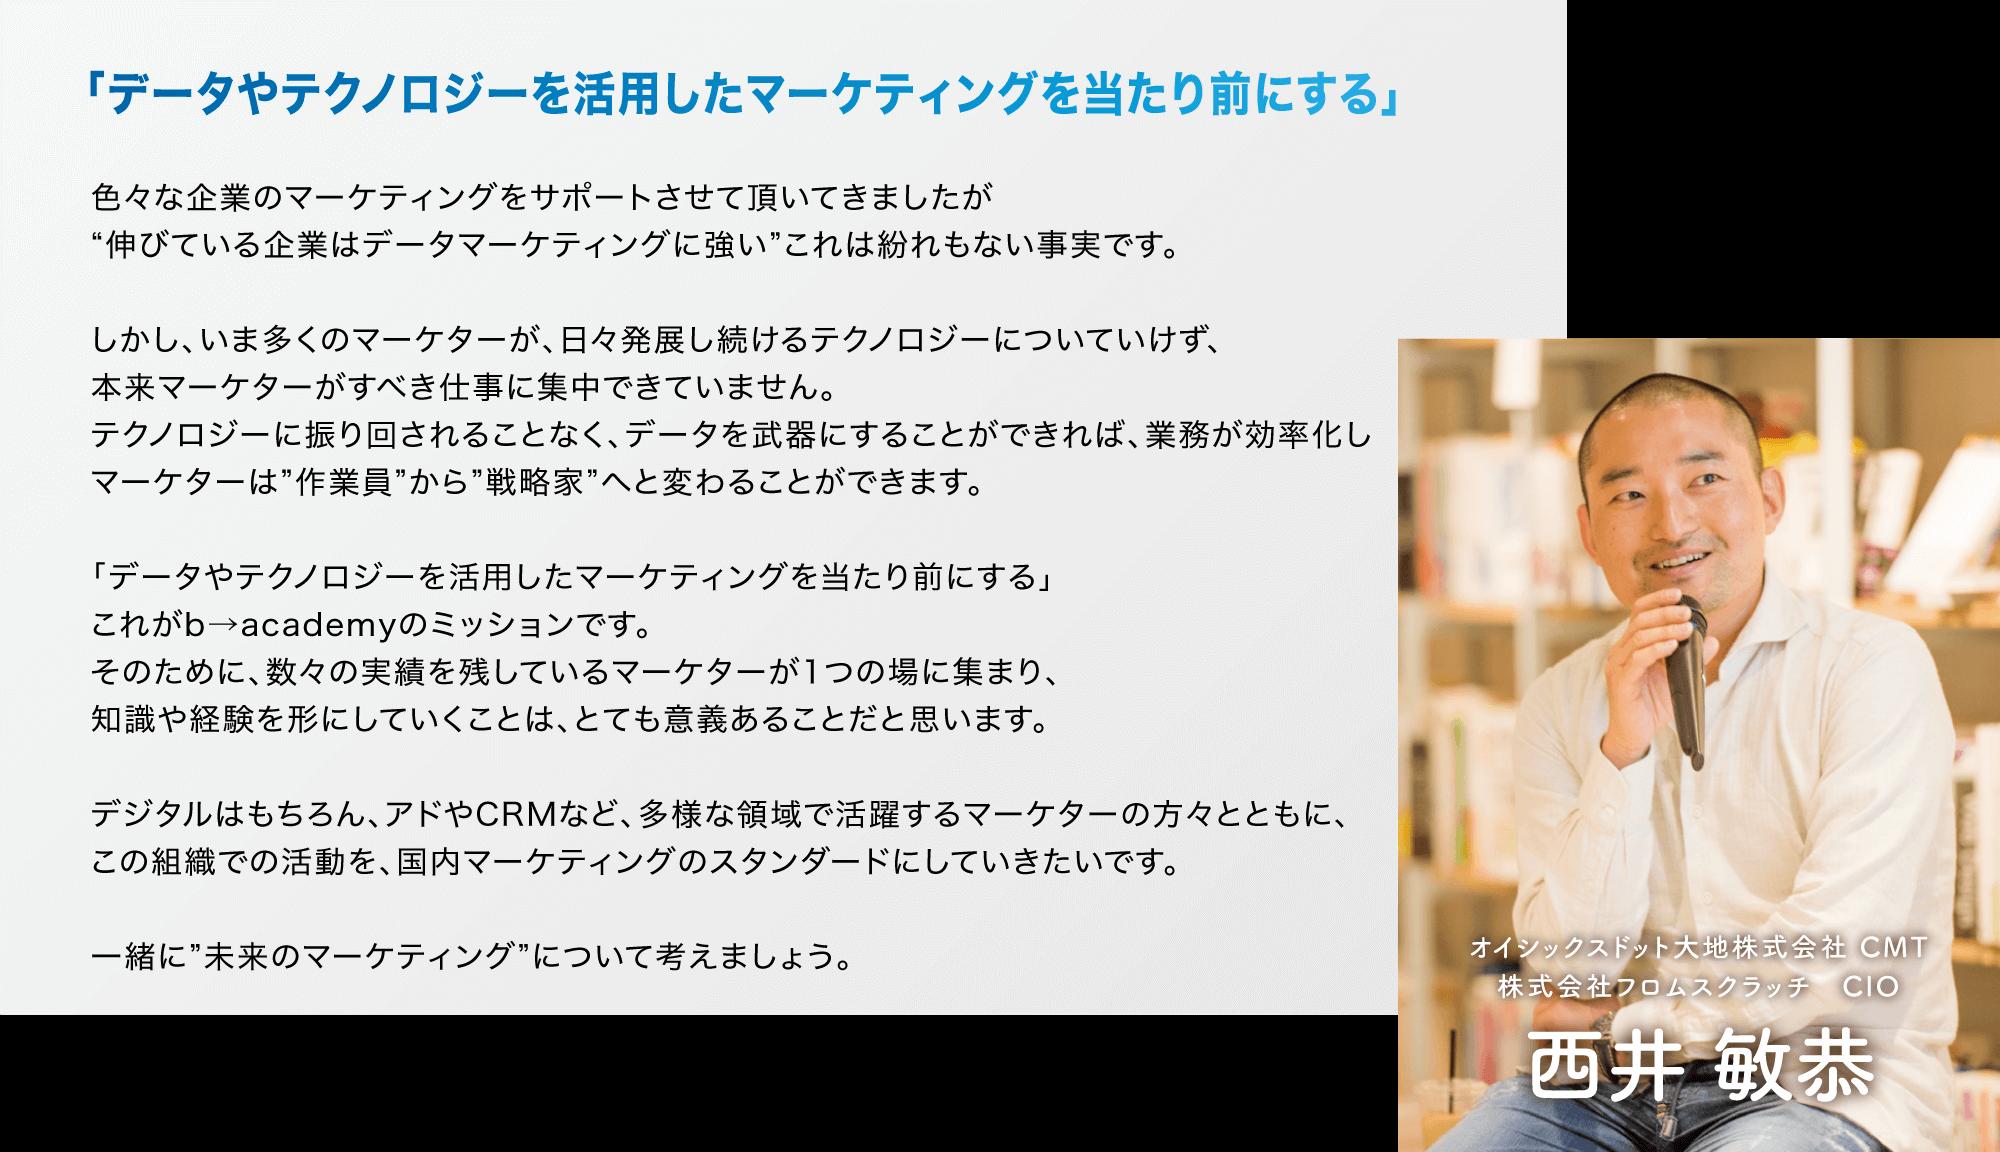 b→academy chairman